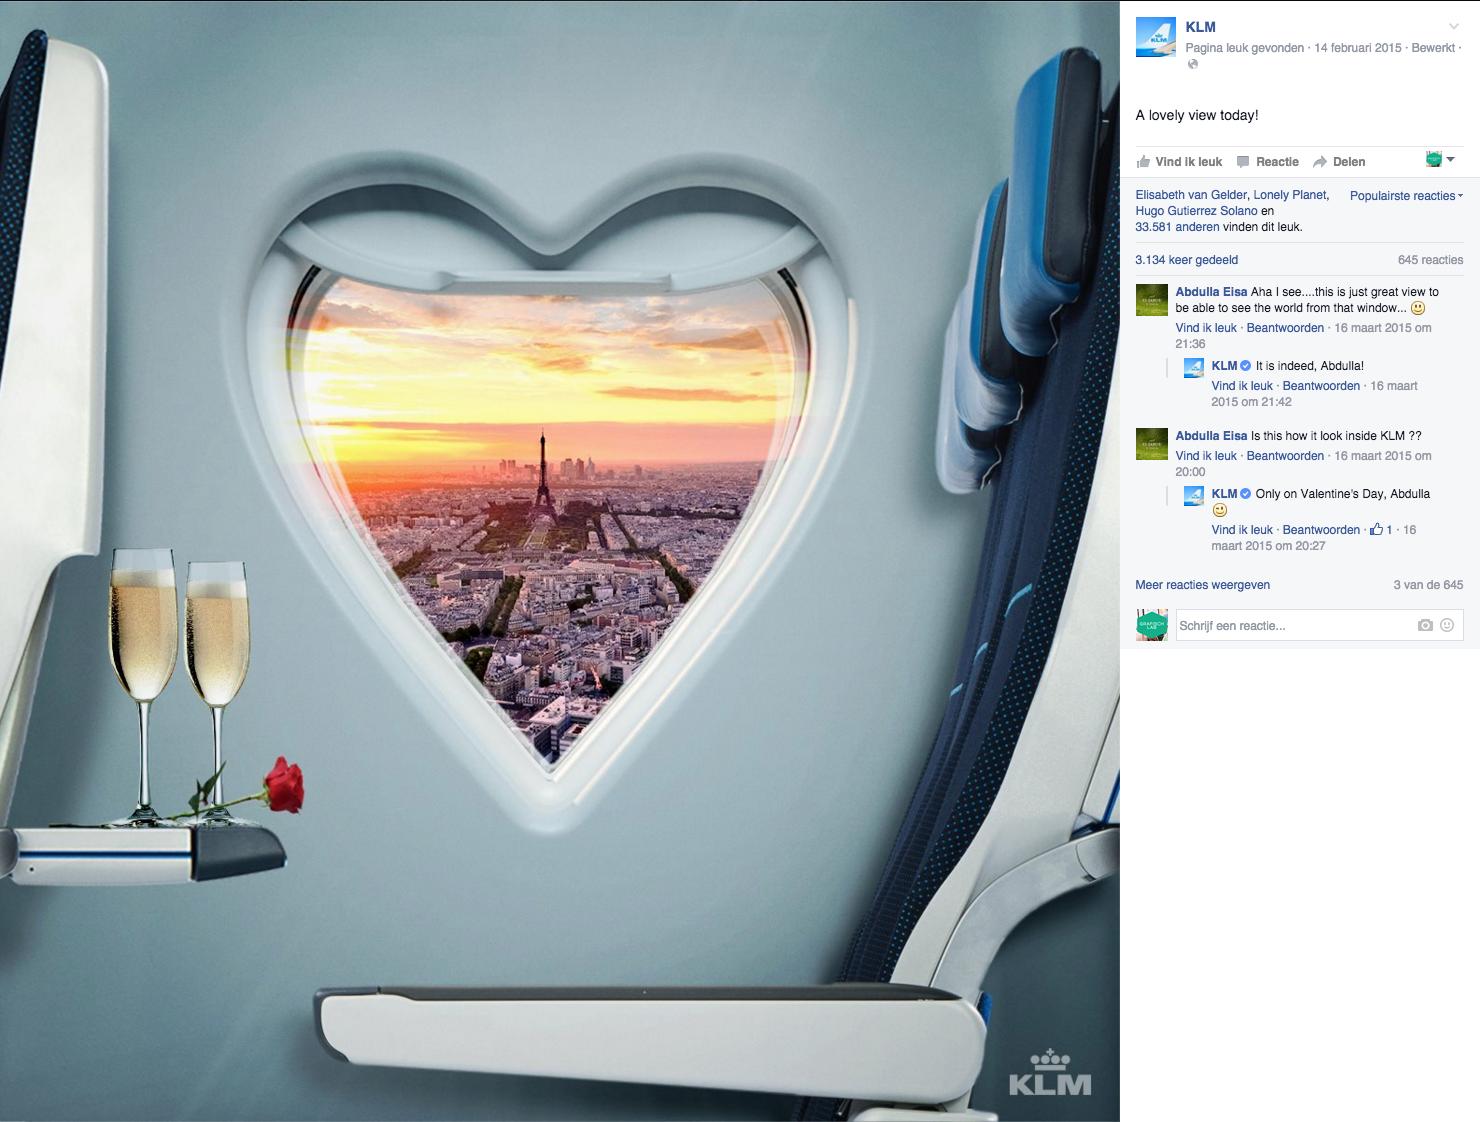 KLM Facebook likes